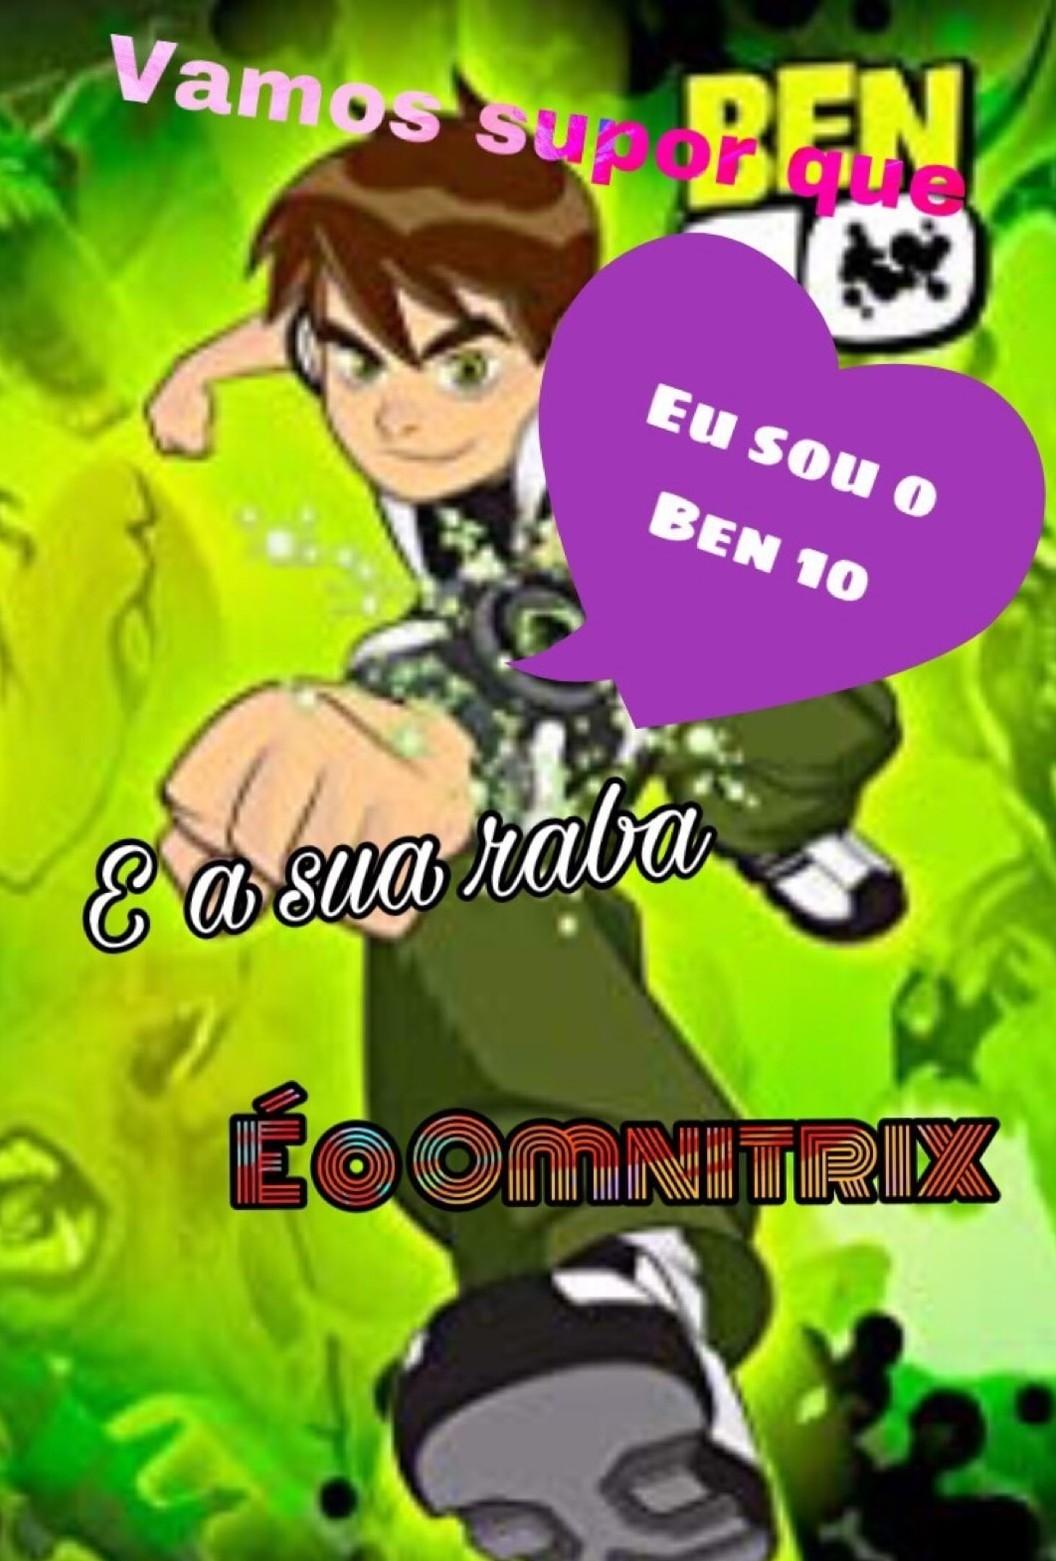 Ominitrix - meme